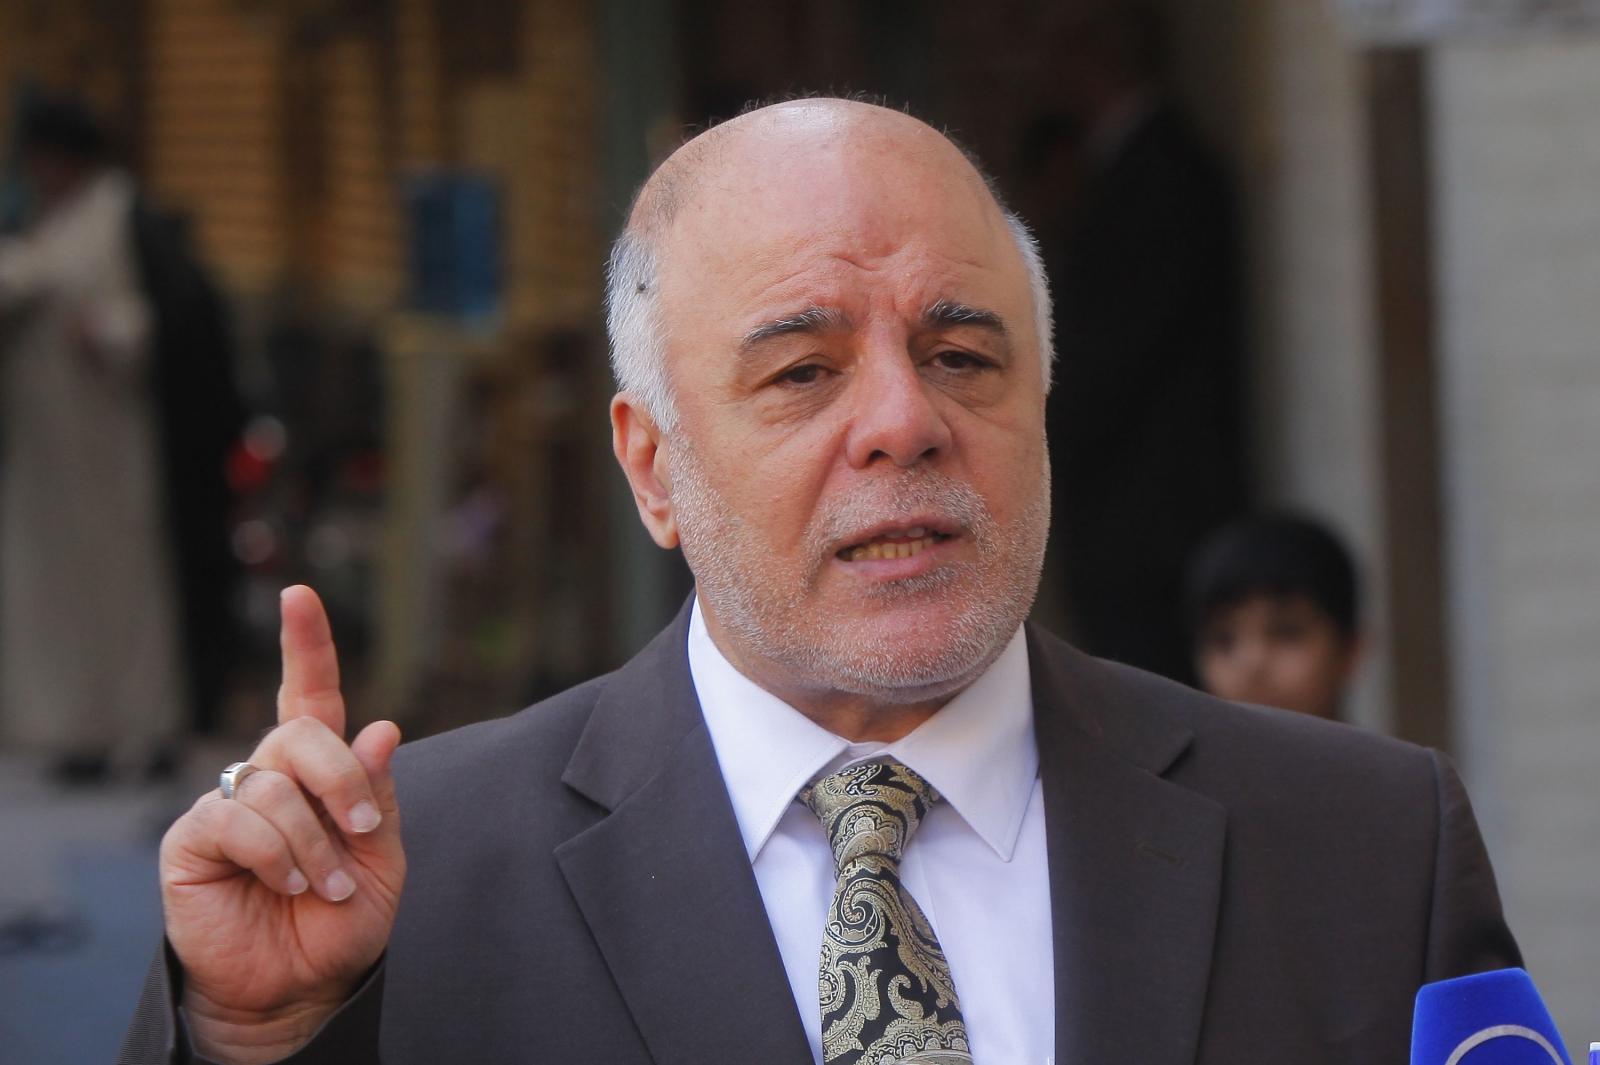 iraqi-pm-haider-al-abadi-iran-isis-talks